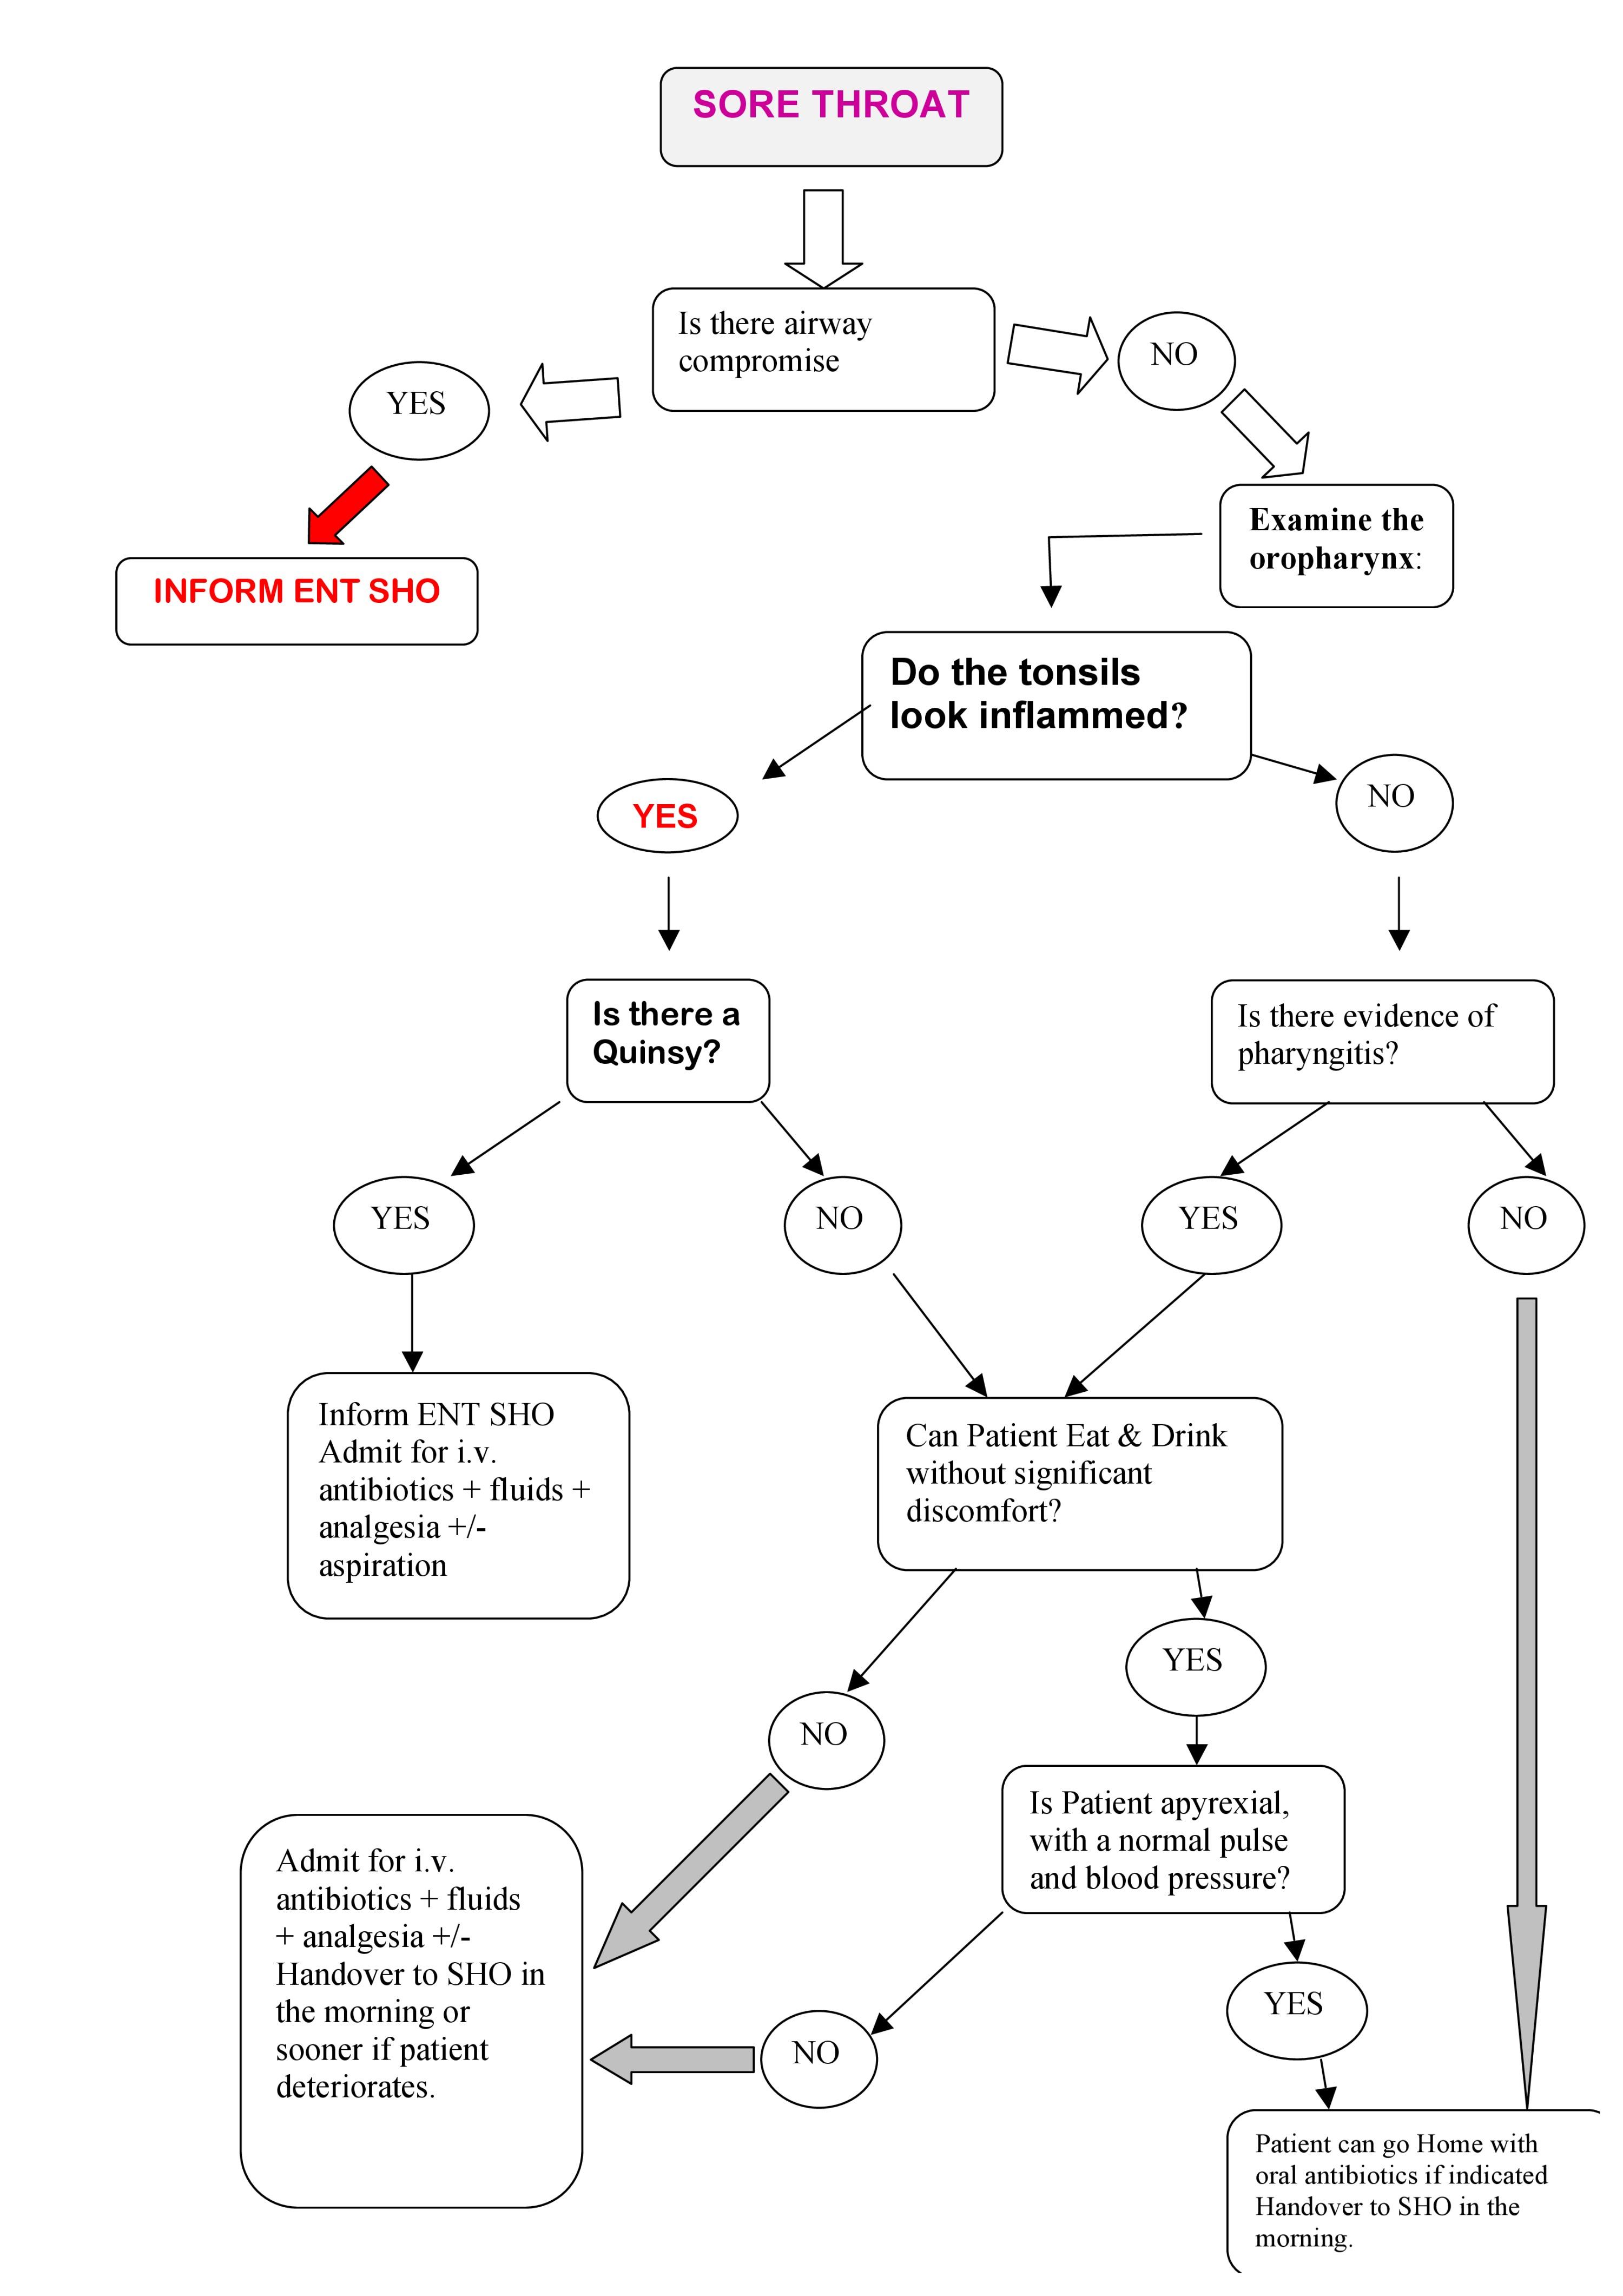 Flow Chart - Managing a sore throat